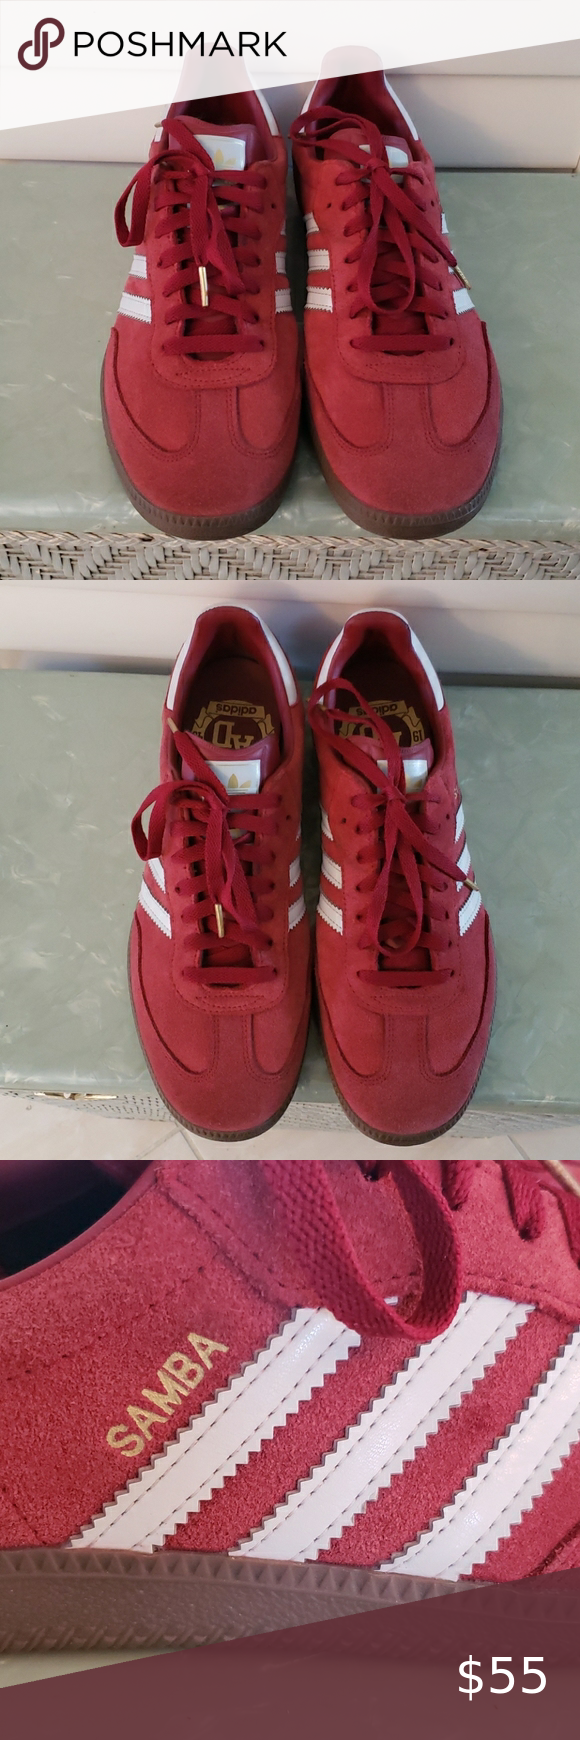 Adidas Samba 1949 suede sneakers size 9